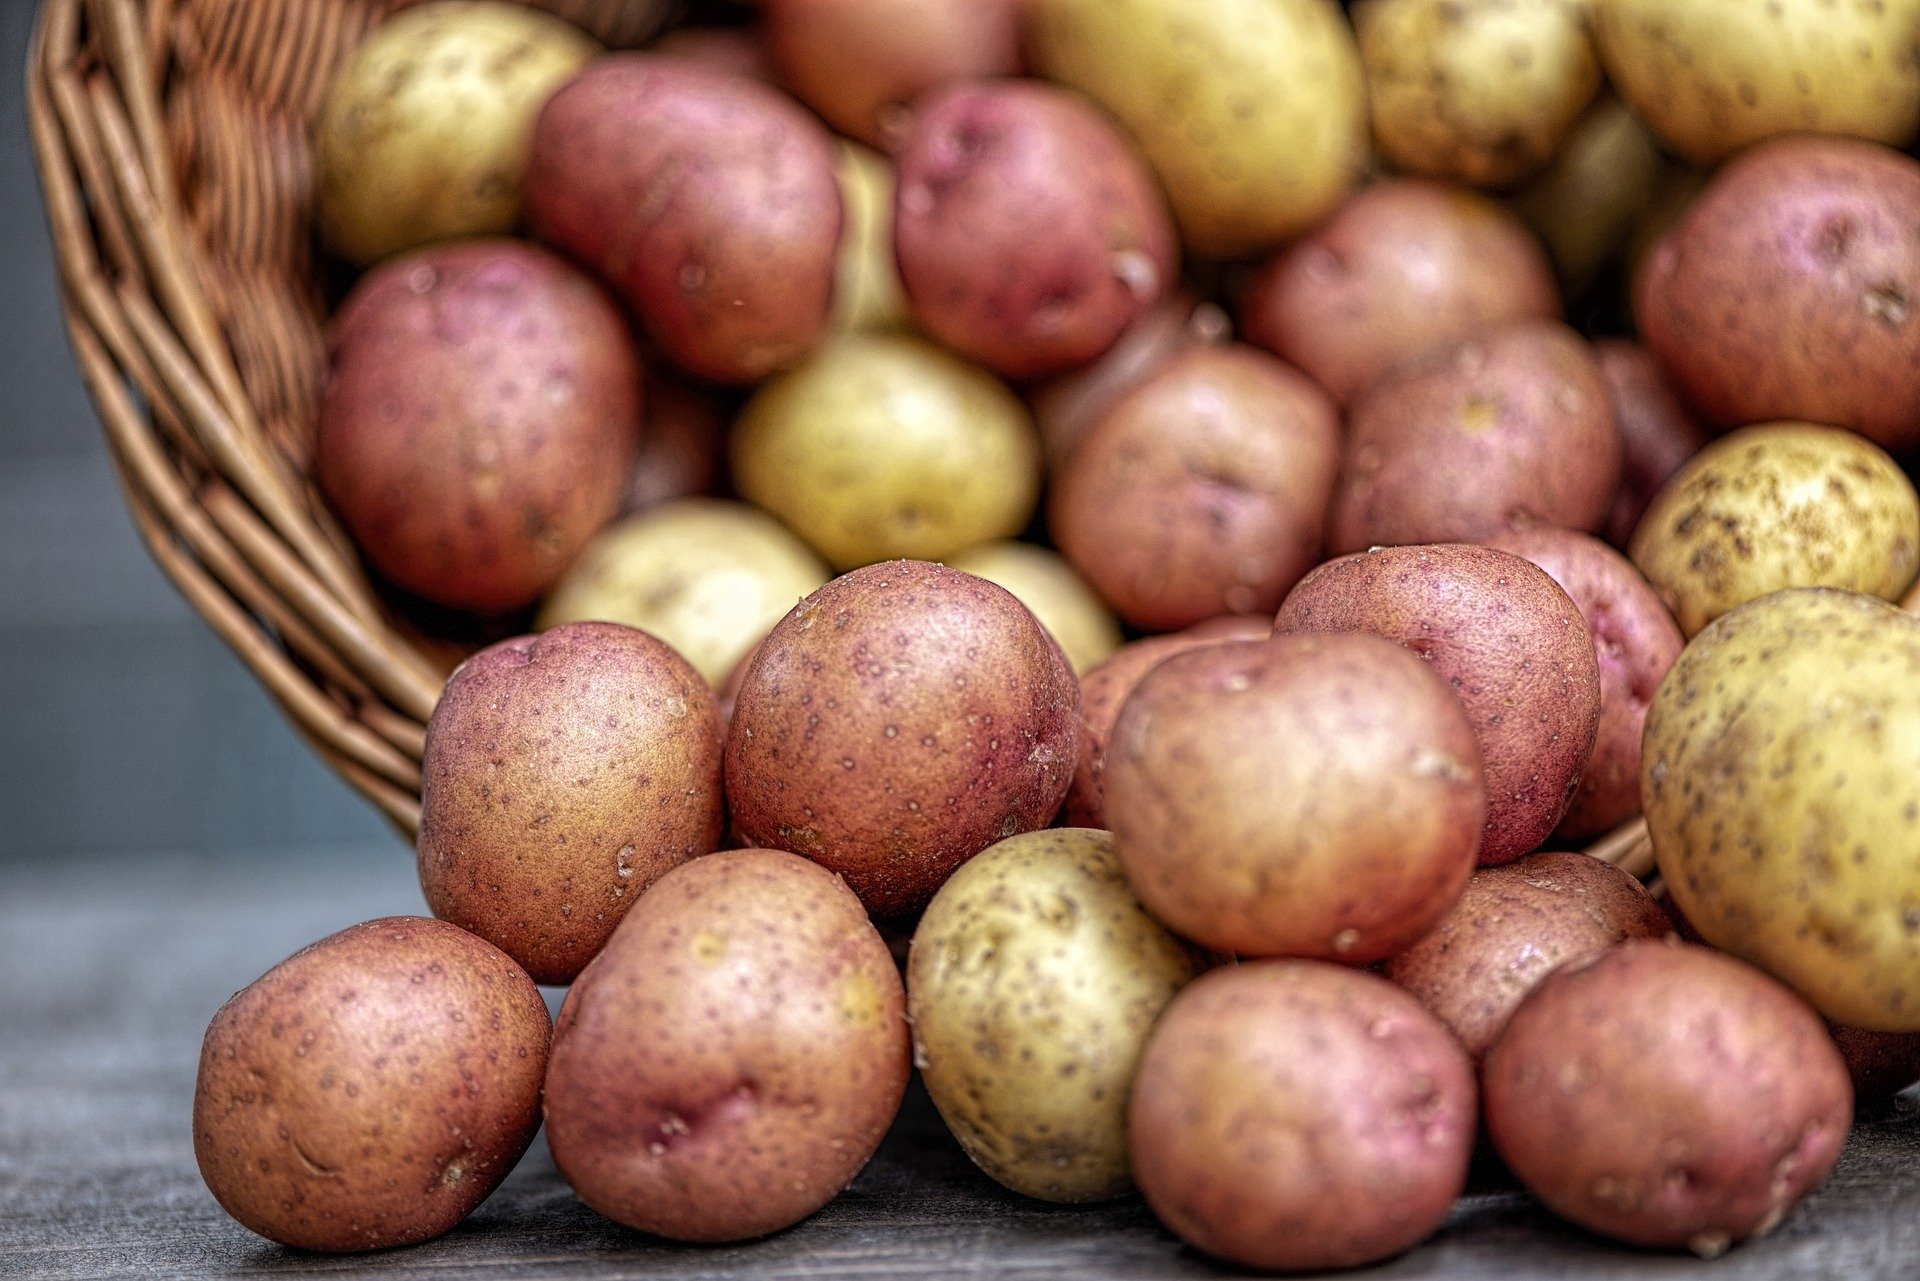 potatoes-4331742_1920